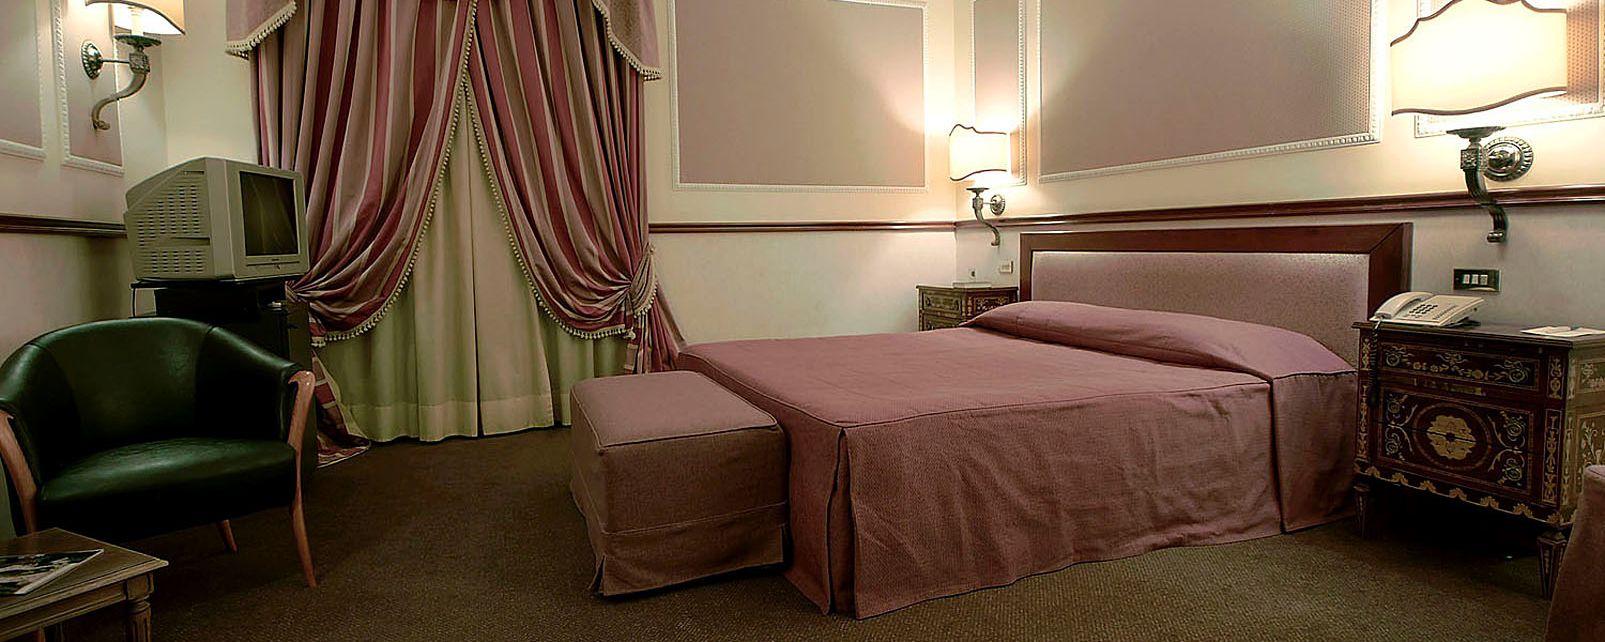 Hôtel Savoy Hotel Rome